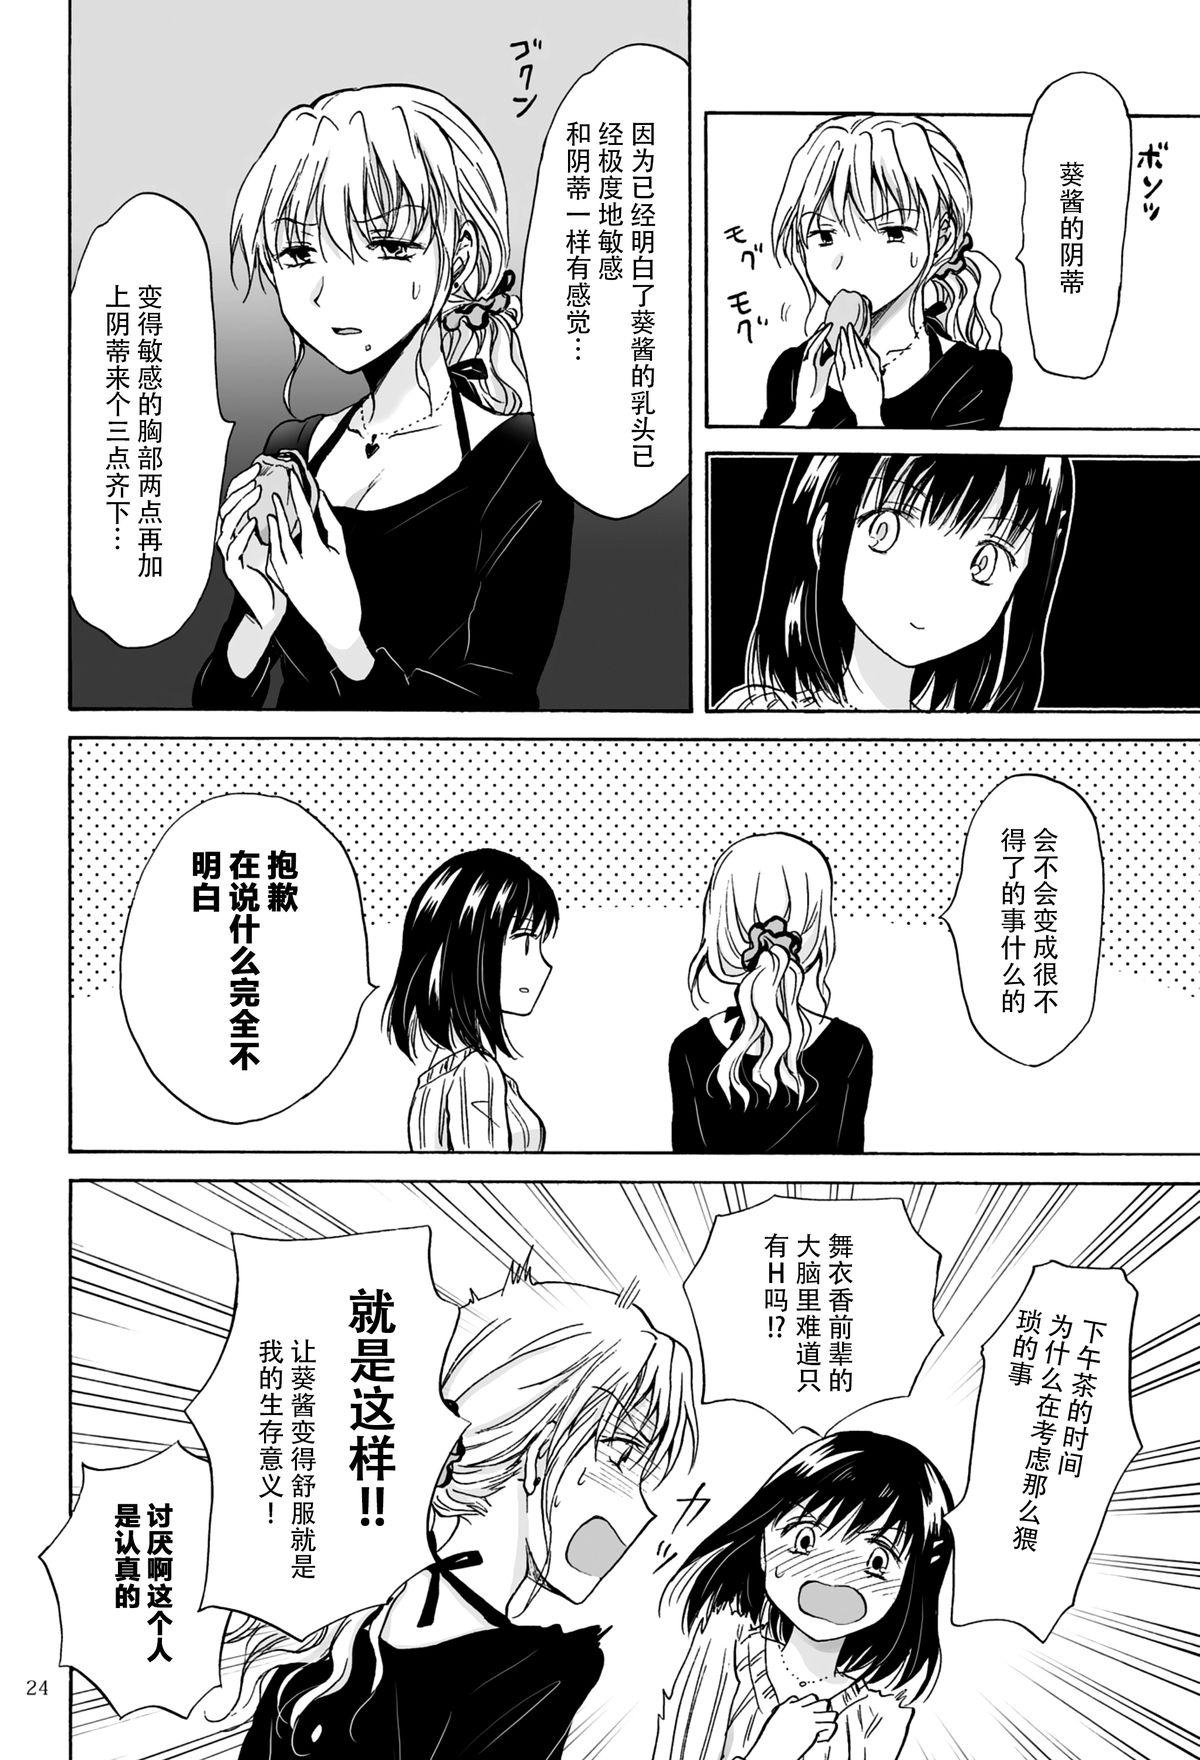 OL-san ga Oppai dake de Icchau Manga 24